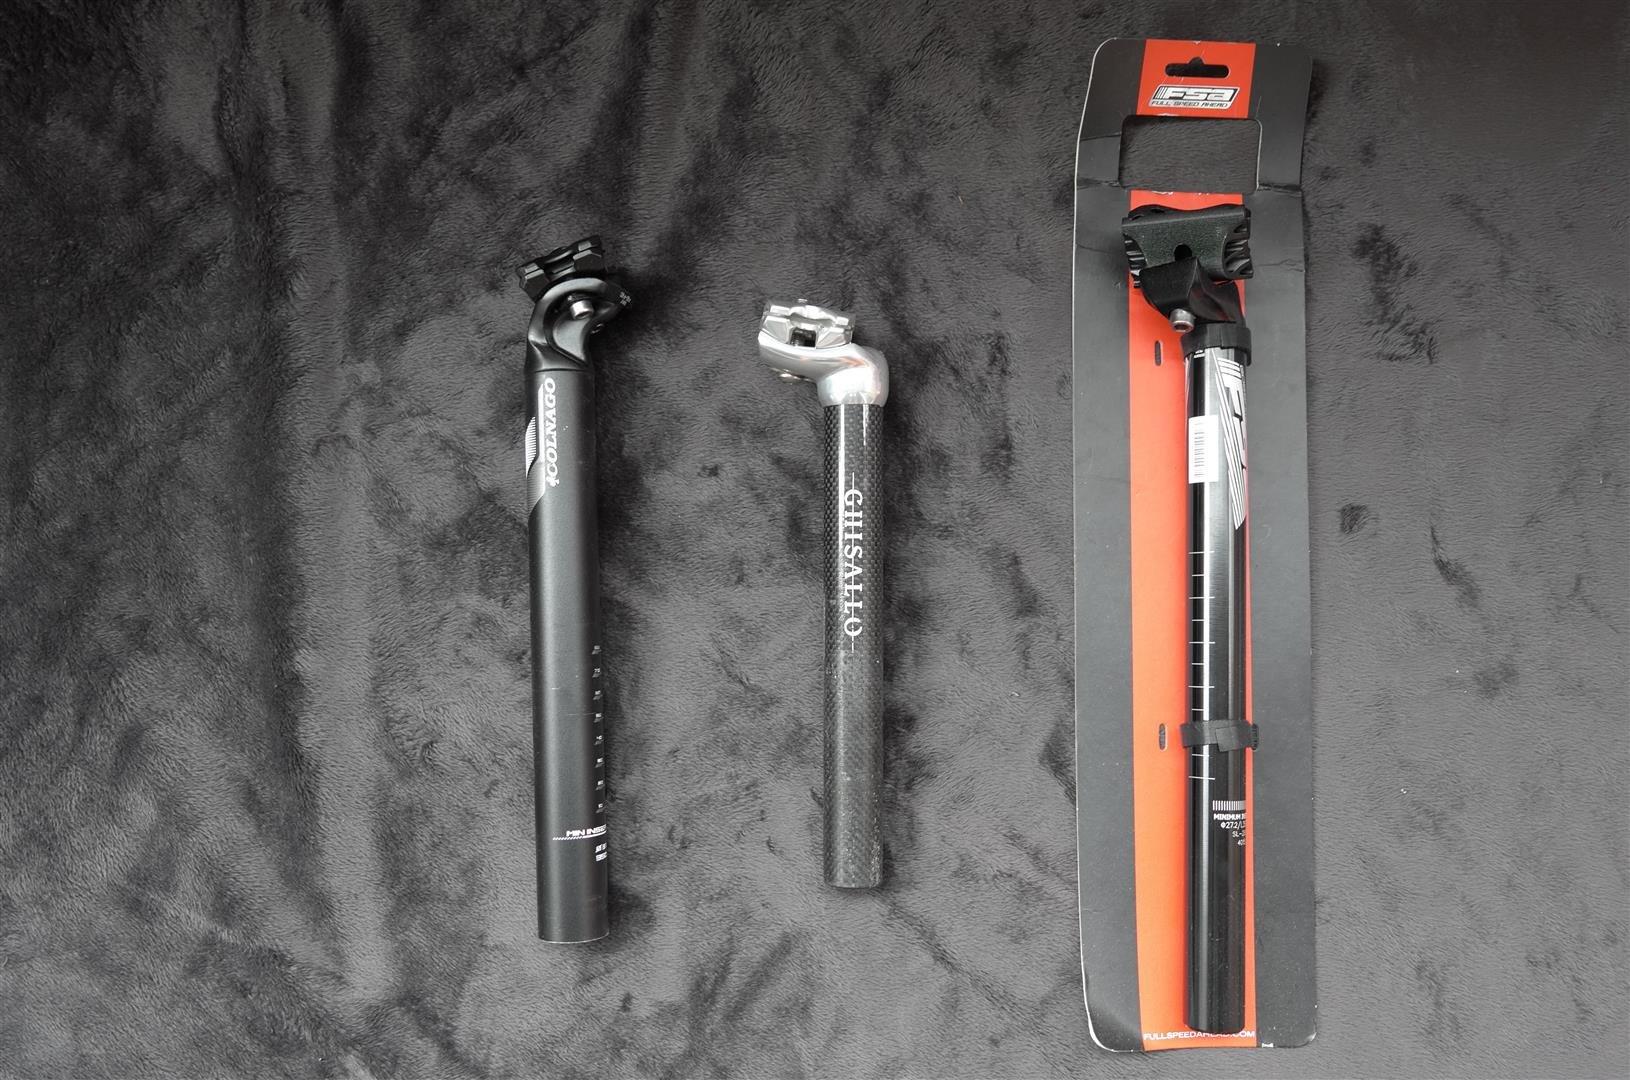 Colnago 31.6 鋁 / FSA Gossamer SL-282 鋁 / Ghisallo 27.2 碳纖 座管